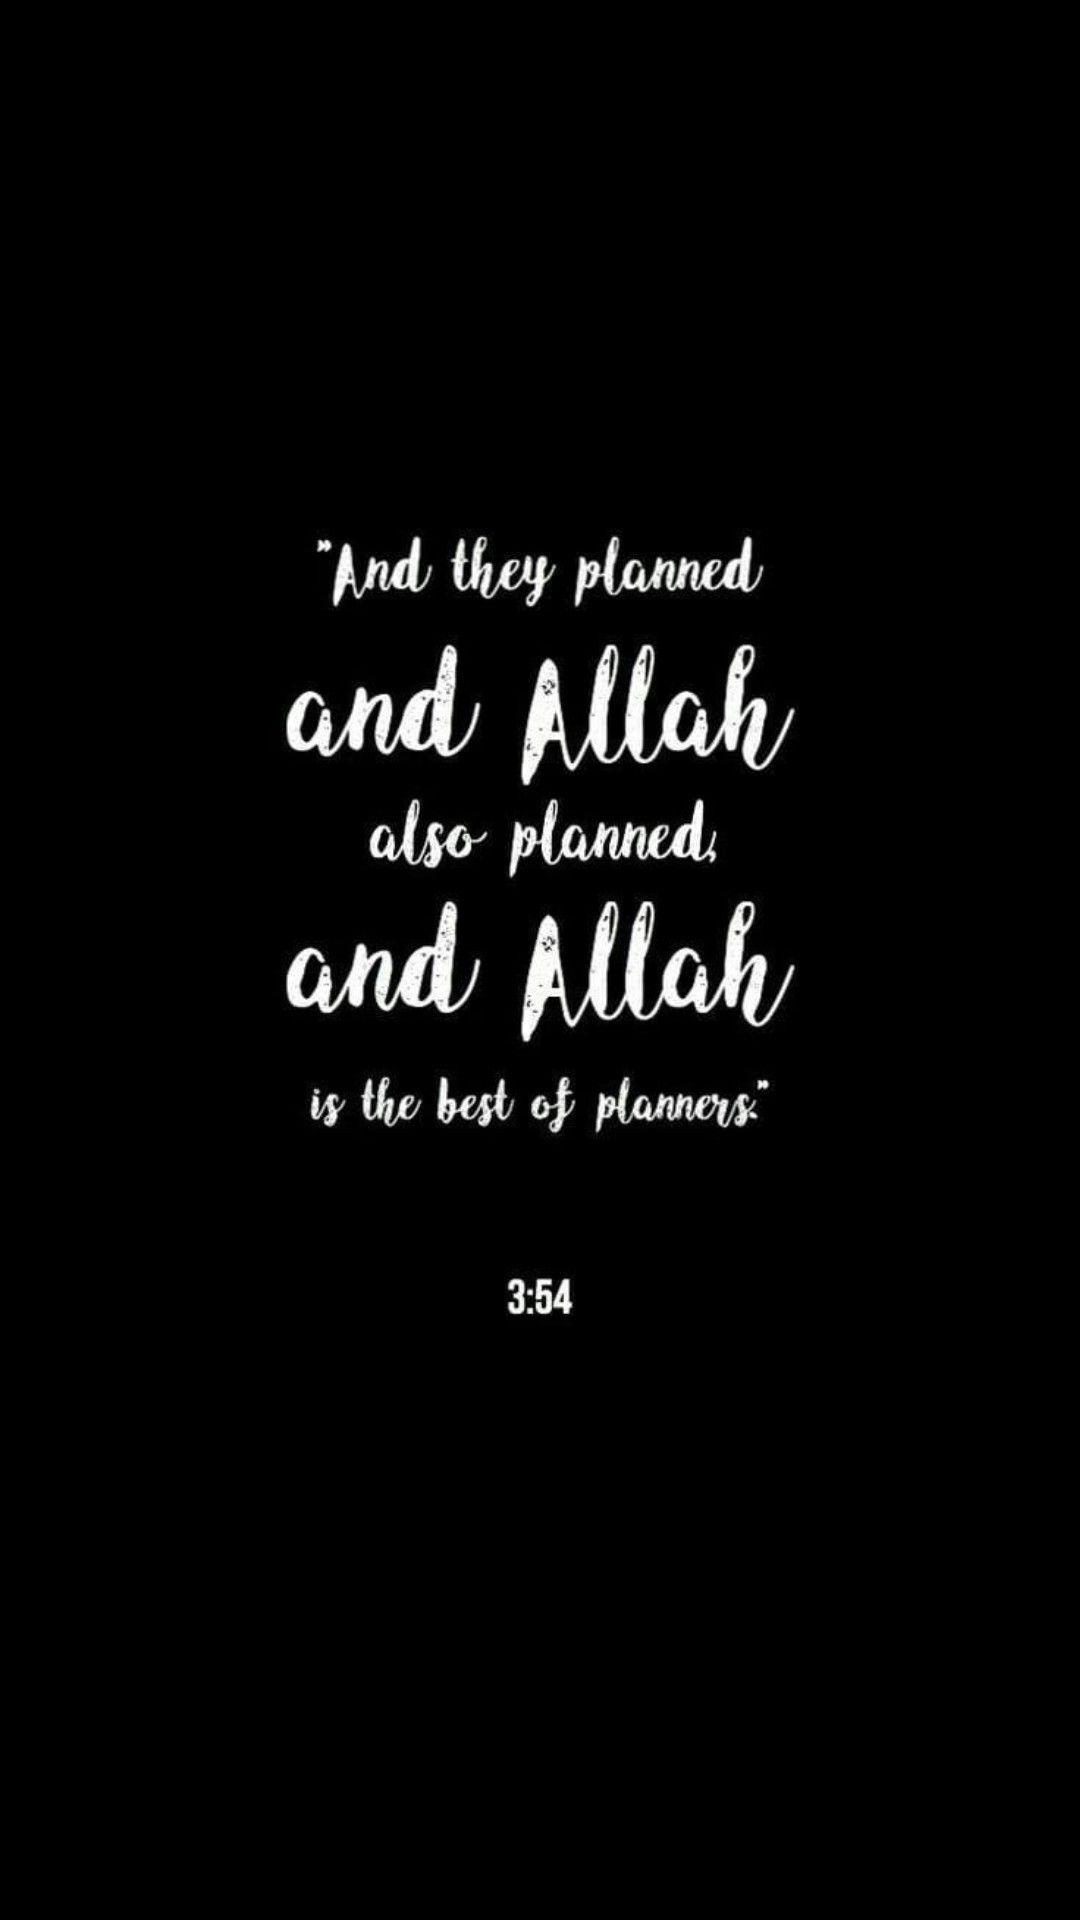 Pin Oleh Holy✨ Di Muslim Dengan Gambar